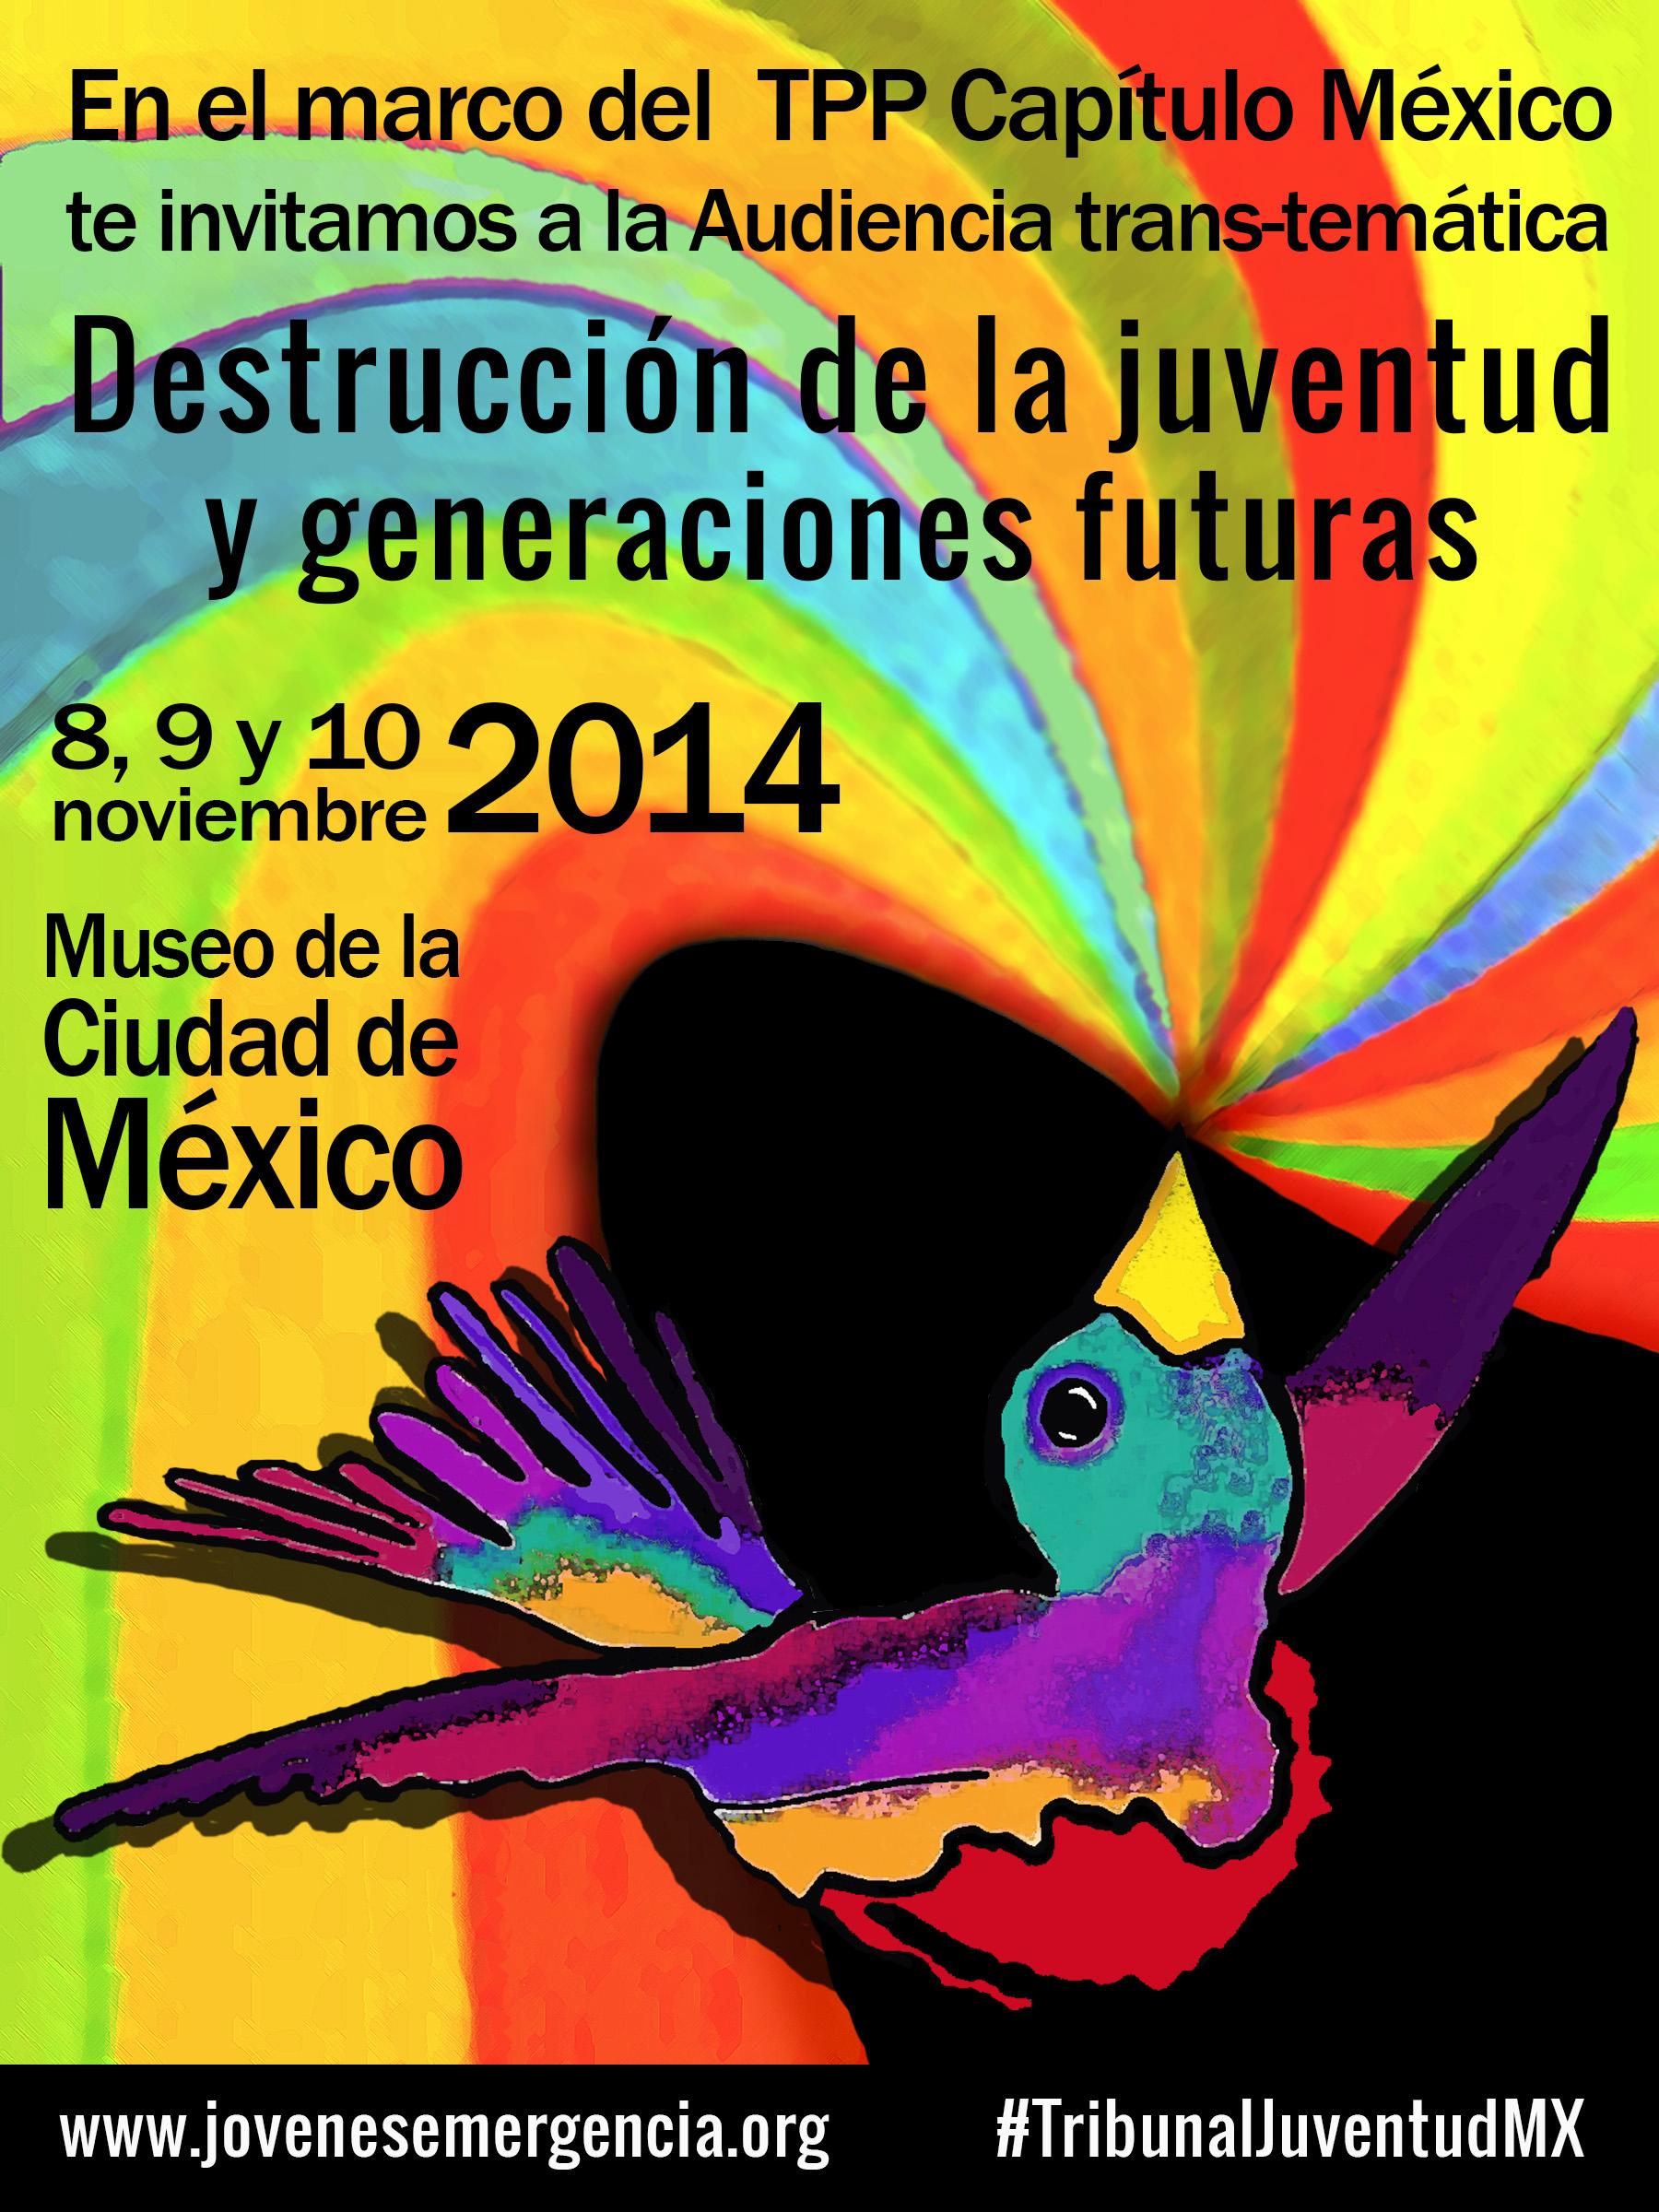 cartel_tpp_aud_juventud_genfuturas